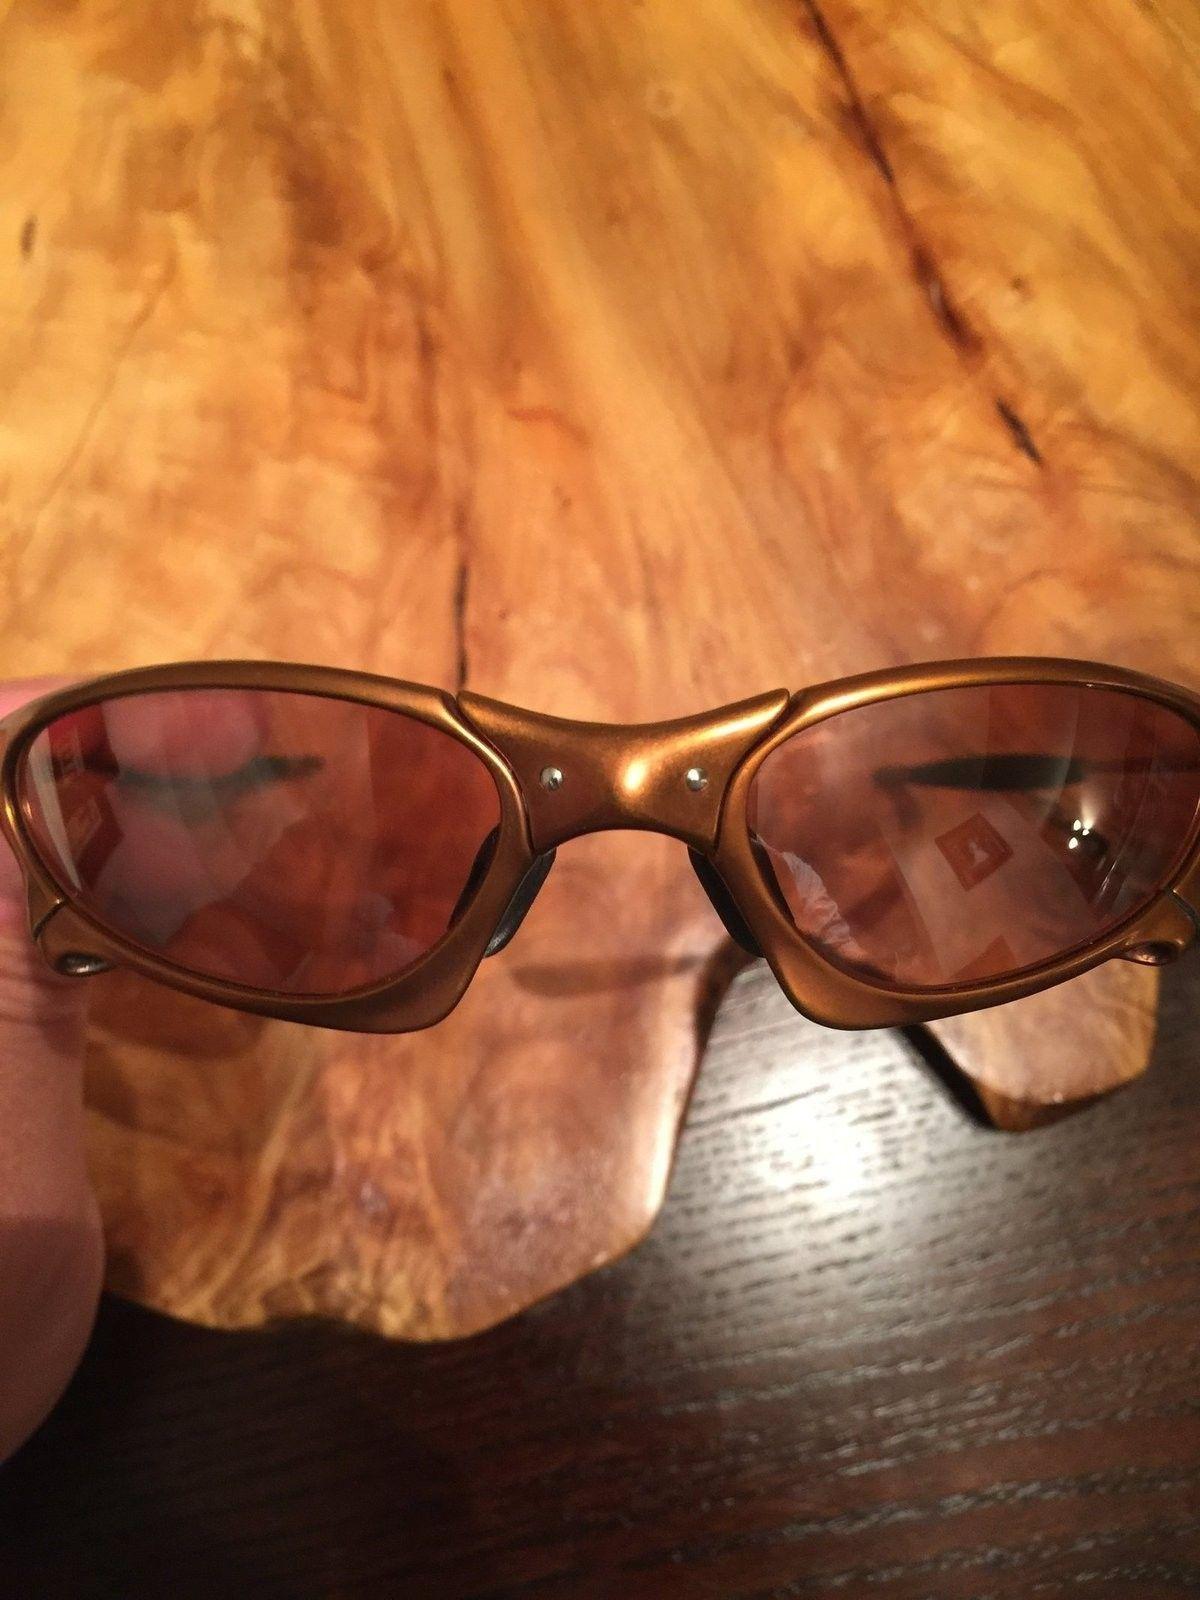 Copper Penny - IMG_2484.JPG